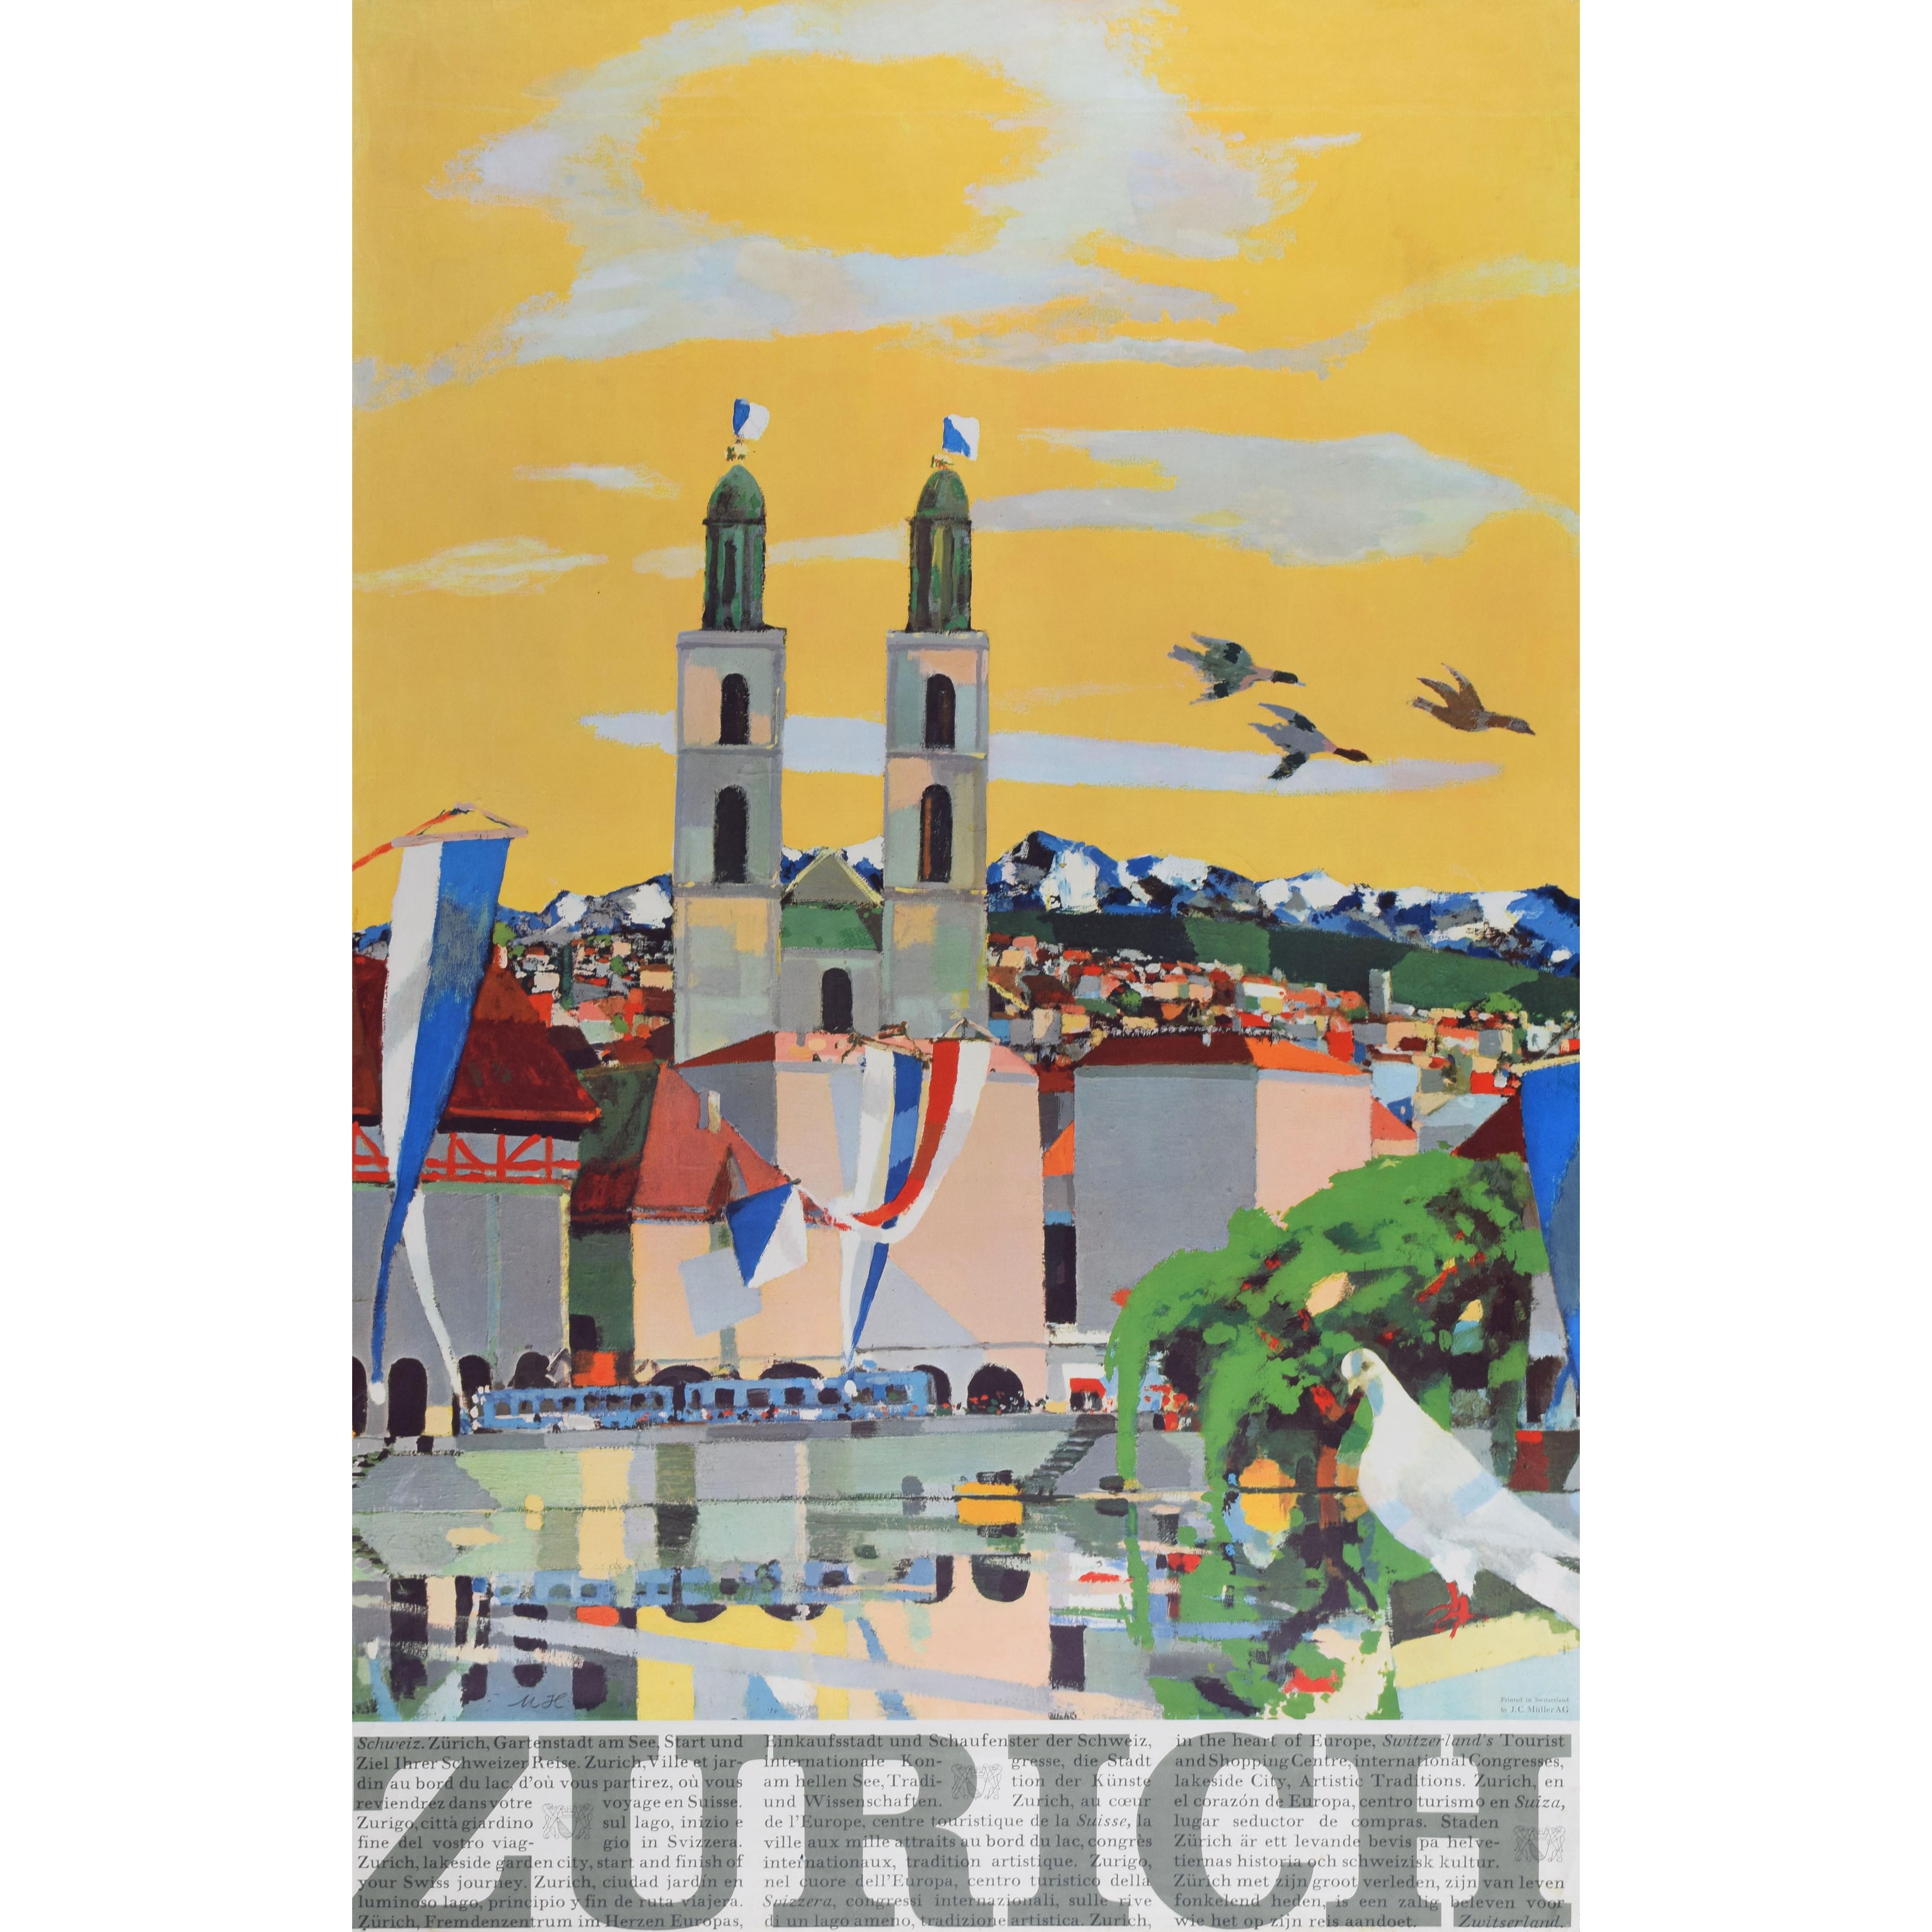 Zurich poster Max Hunsiker